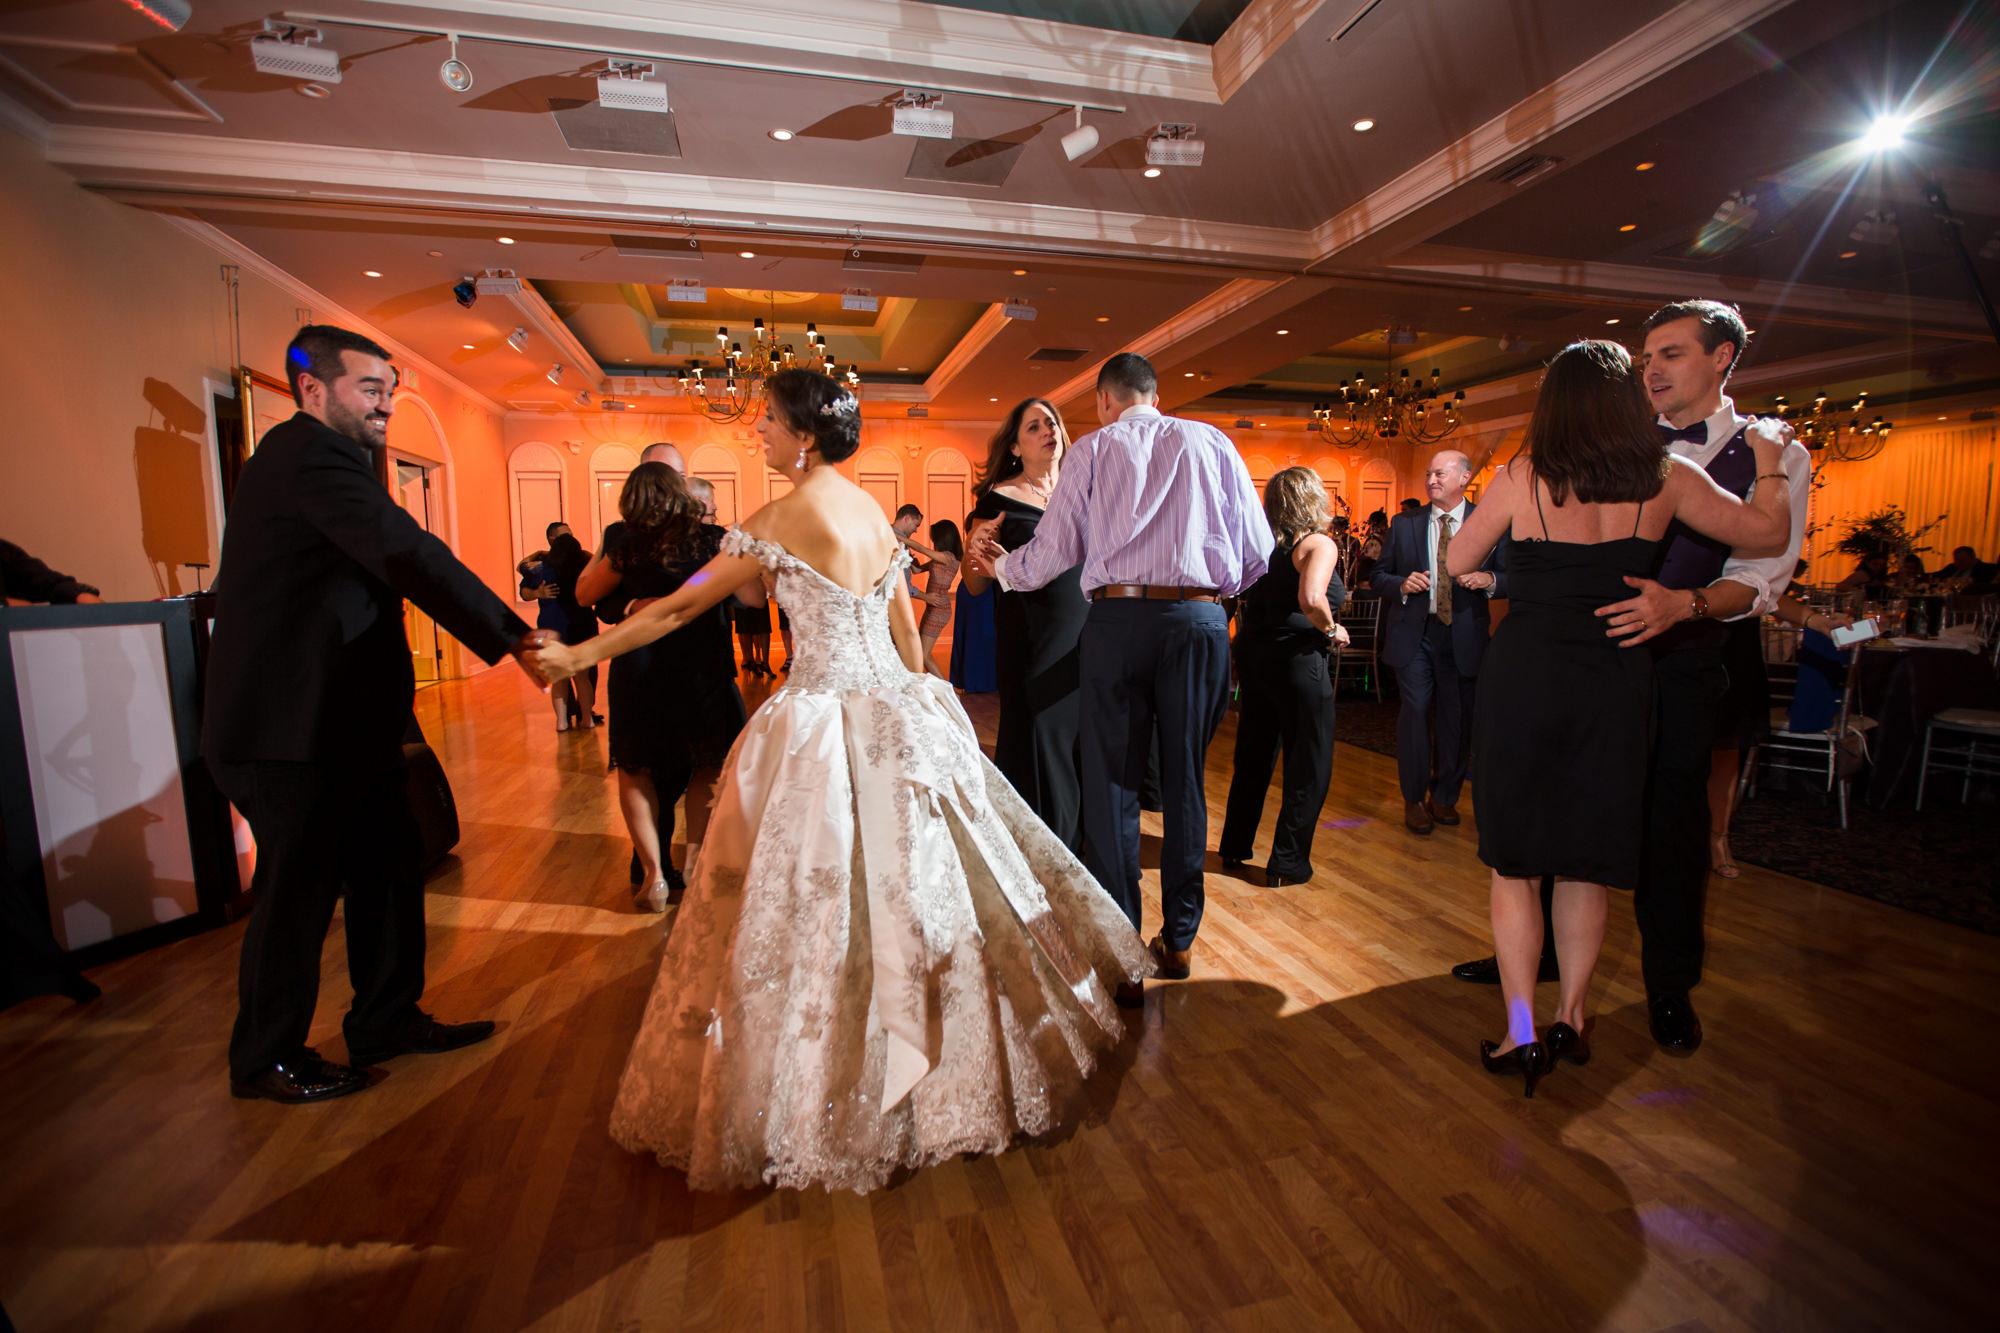 Benvenuto_Wedding_catholic_Florida_Bride-Groom-127.jpg